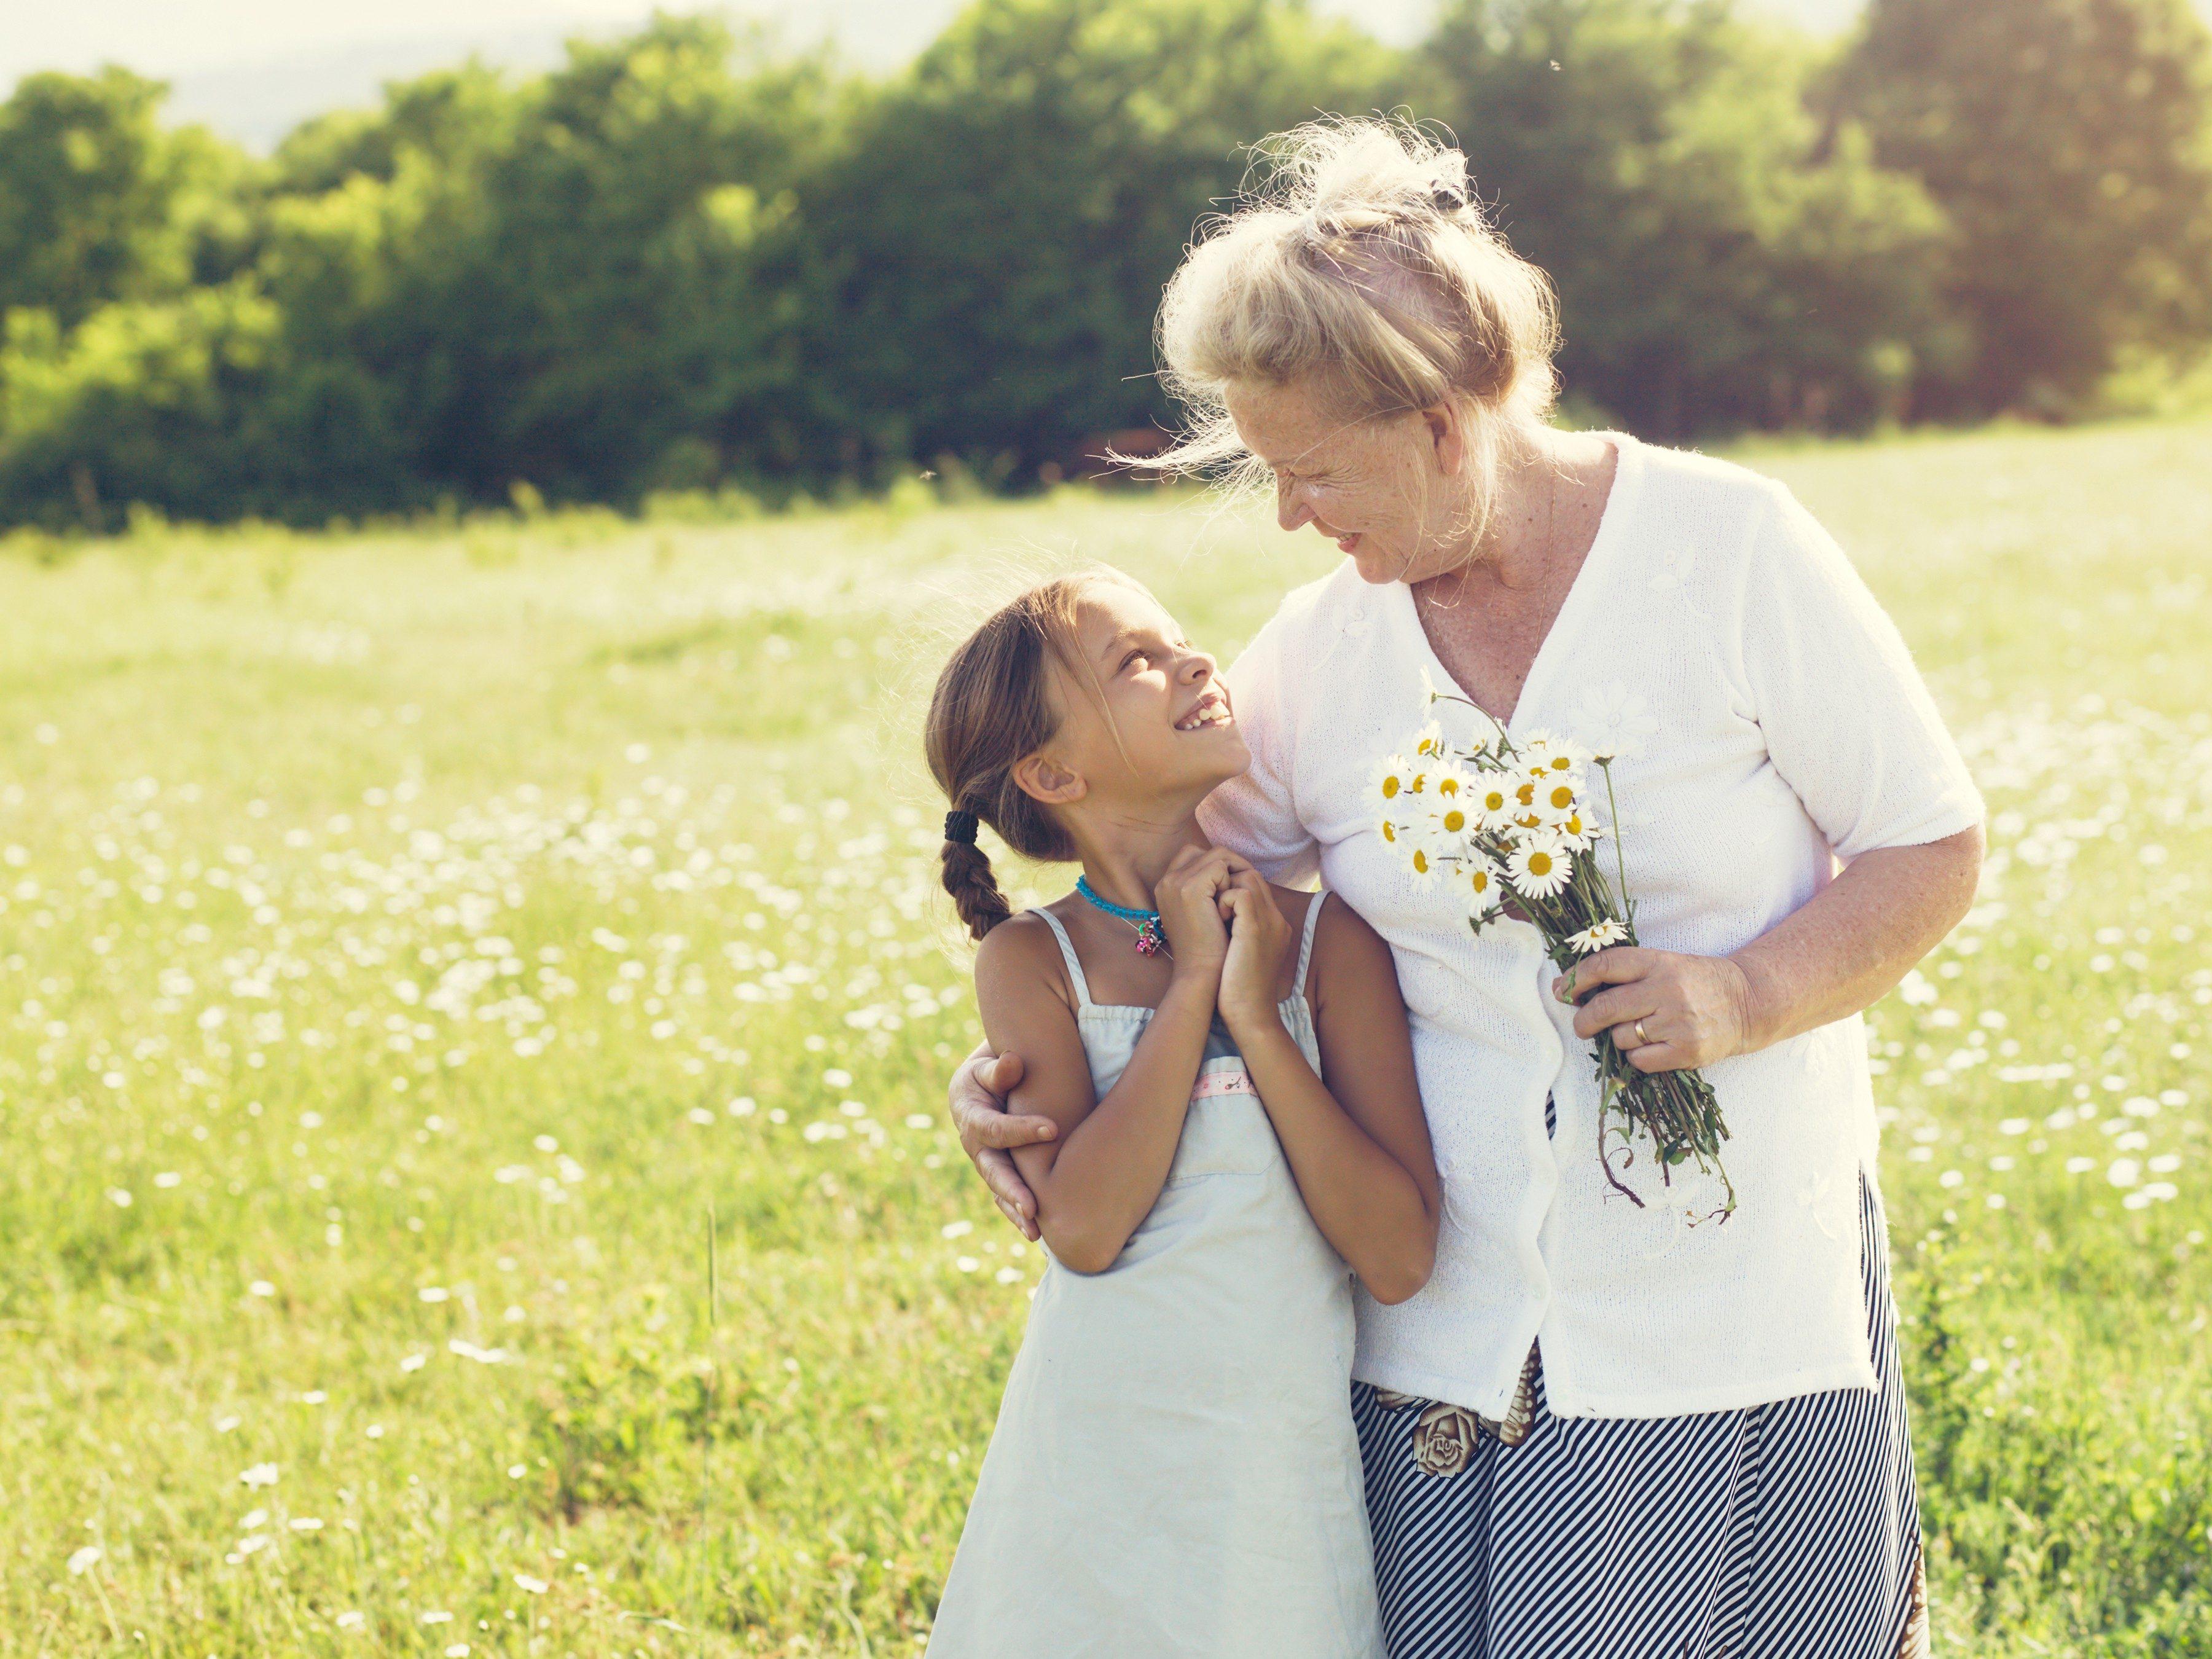 4. Prepare grandchildren for their return to